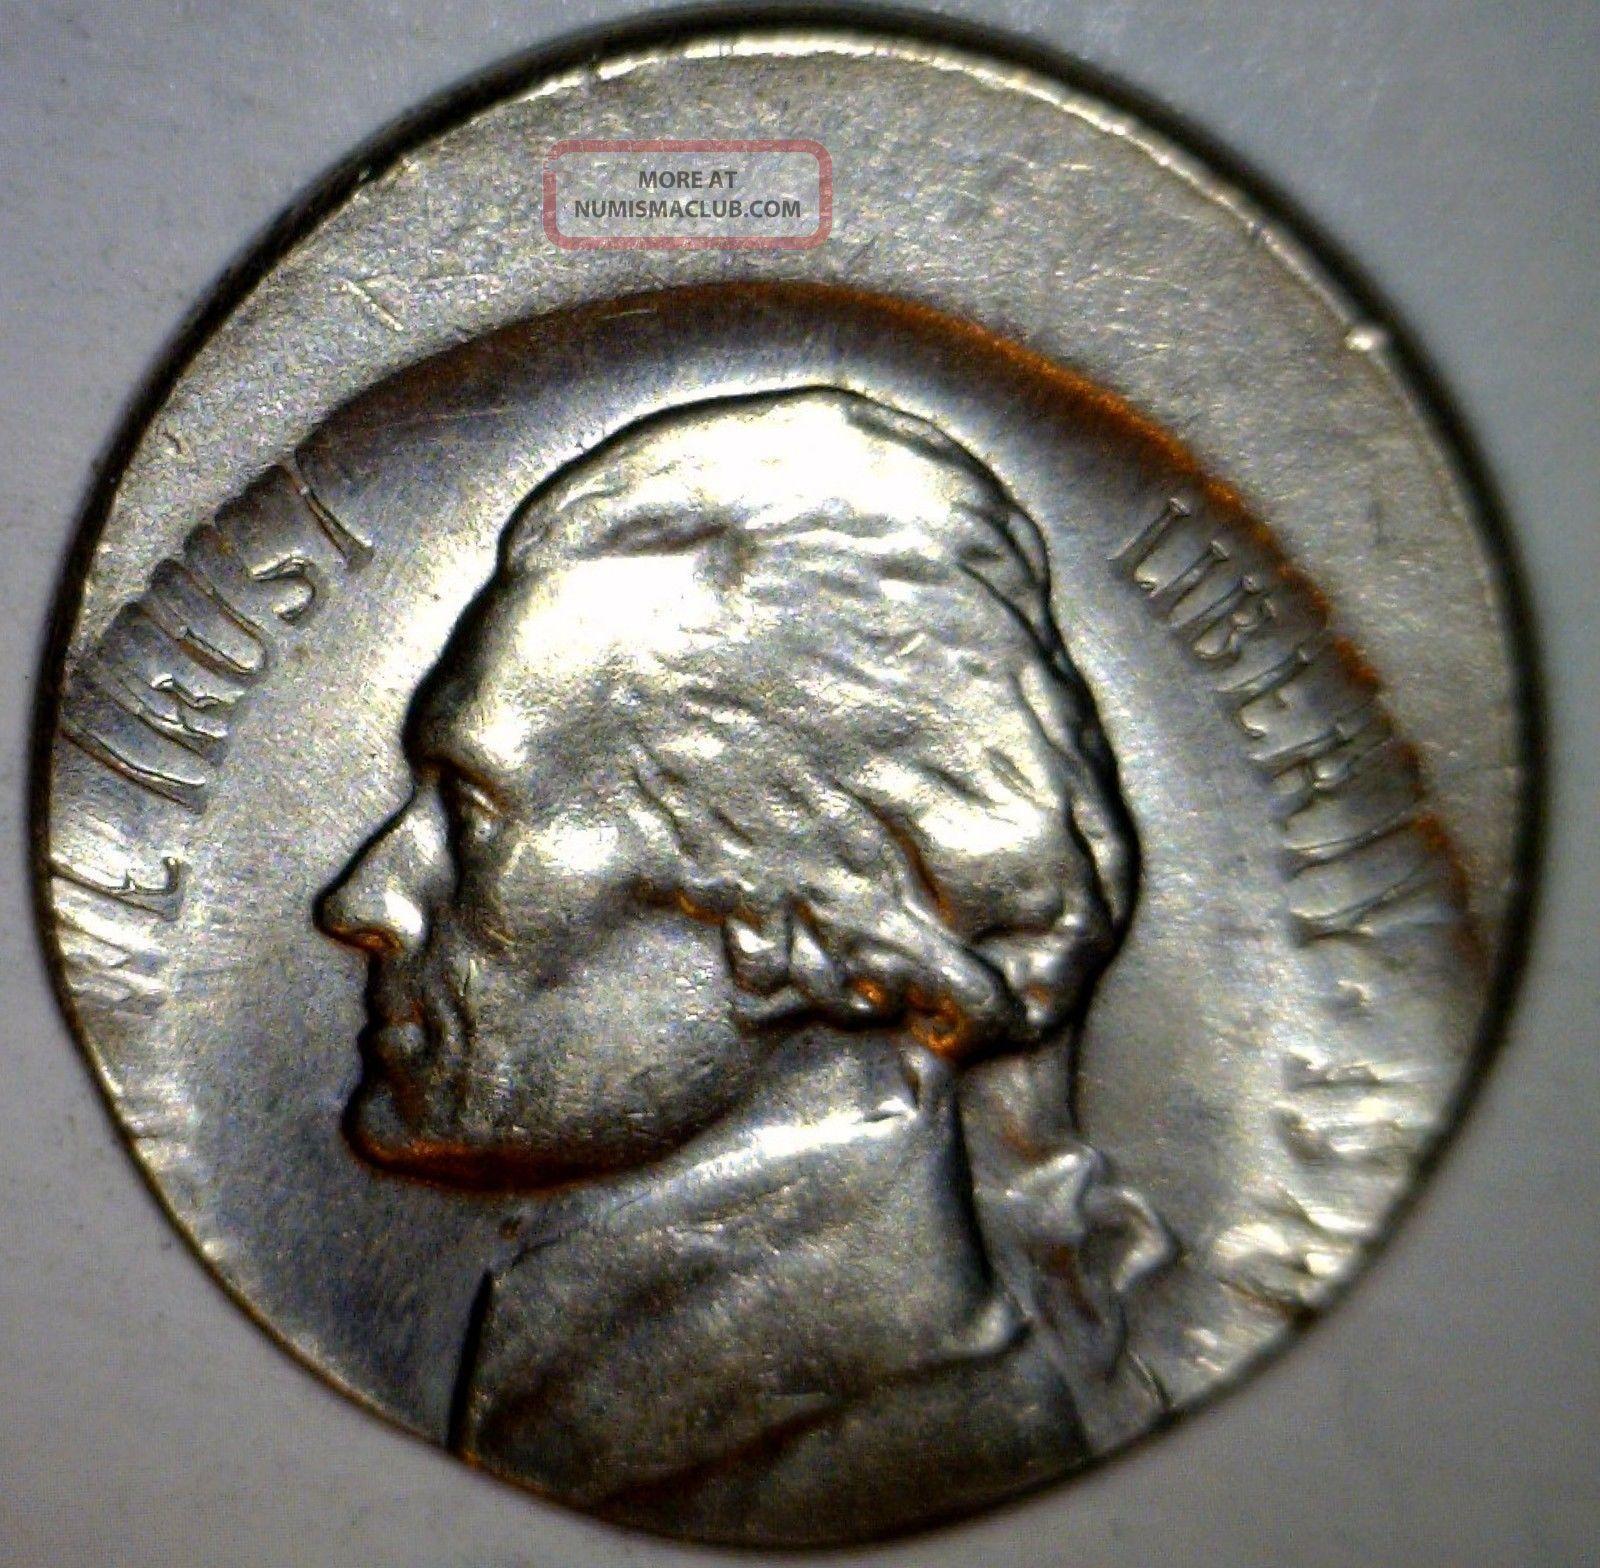 1970d Rare Date Error 20% Off Center Jefferson Nickel Bu